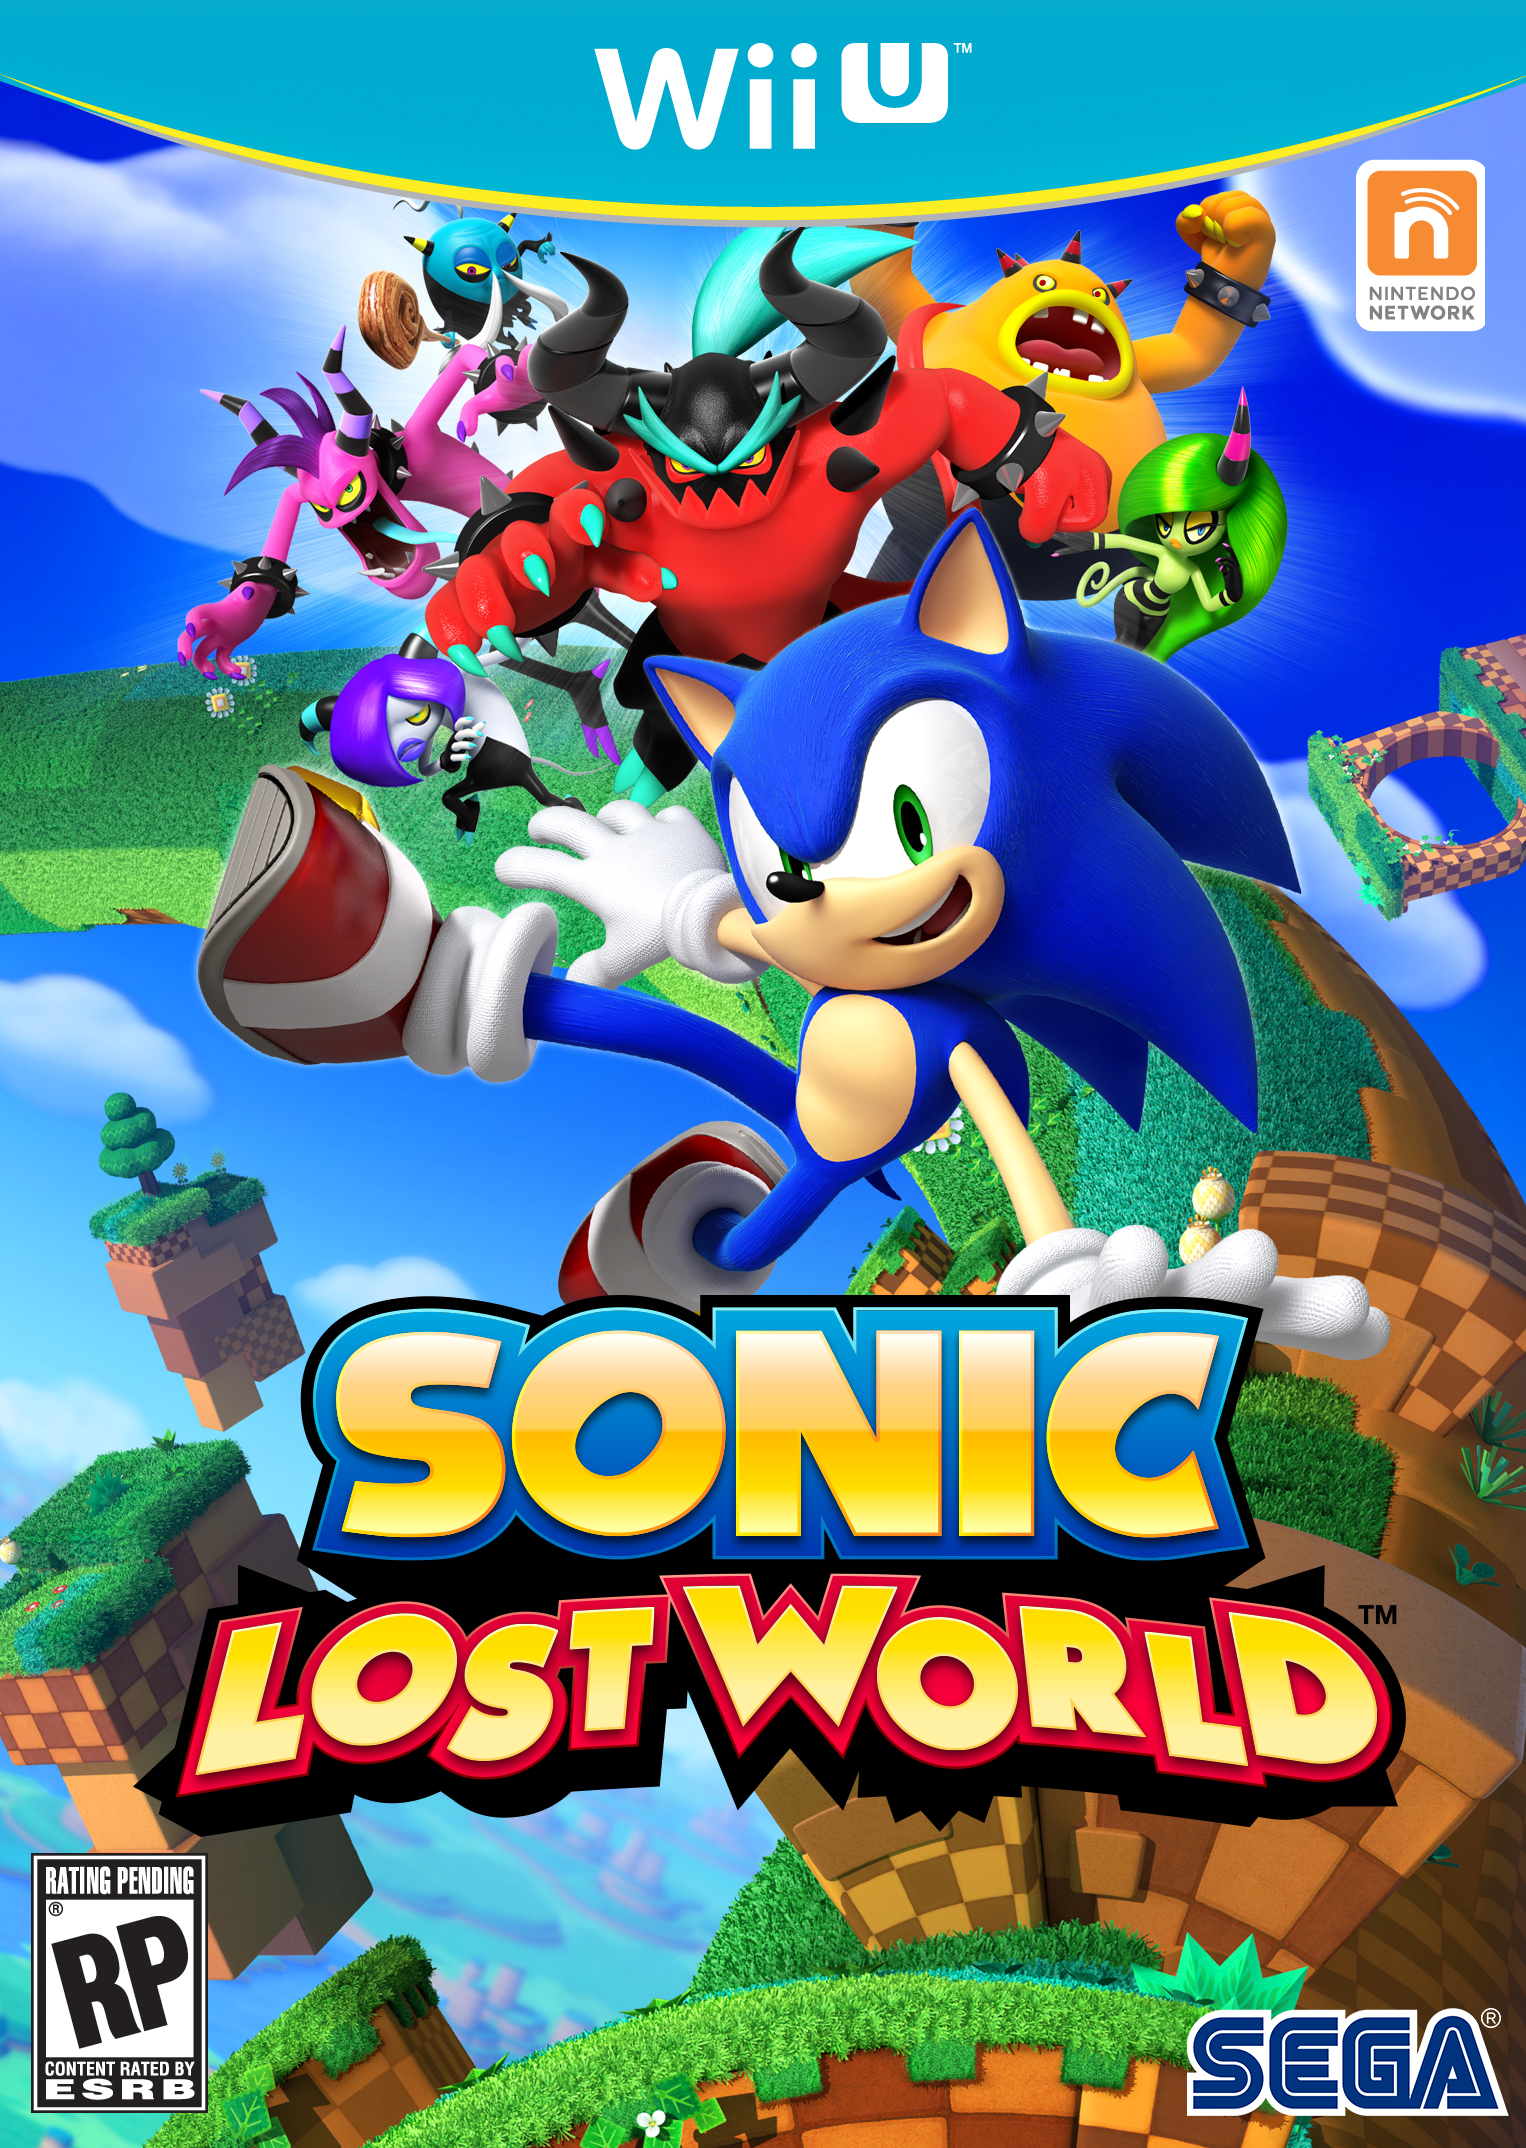 [Discussão] Sonic Lost World [Wii U/3ds] Soniclostworld_wiiu